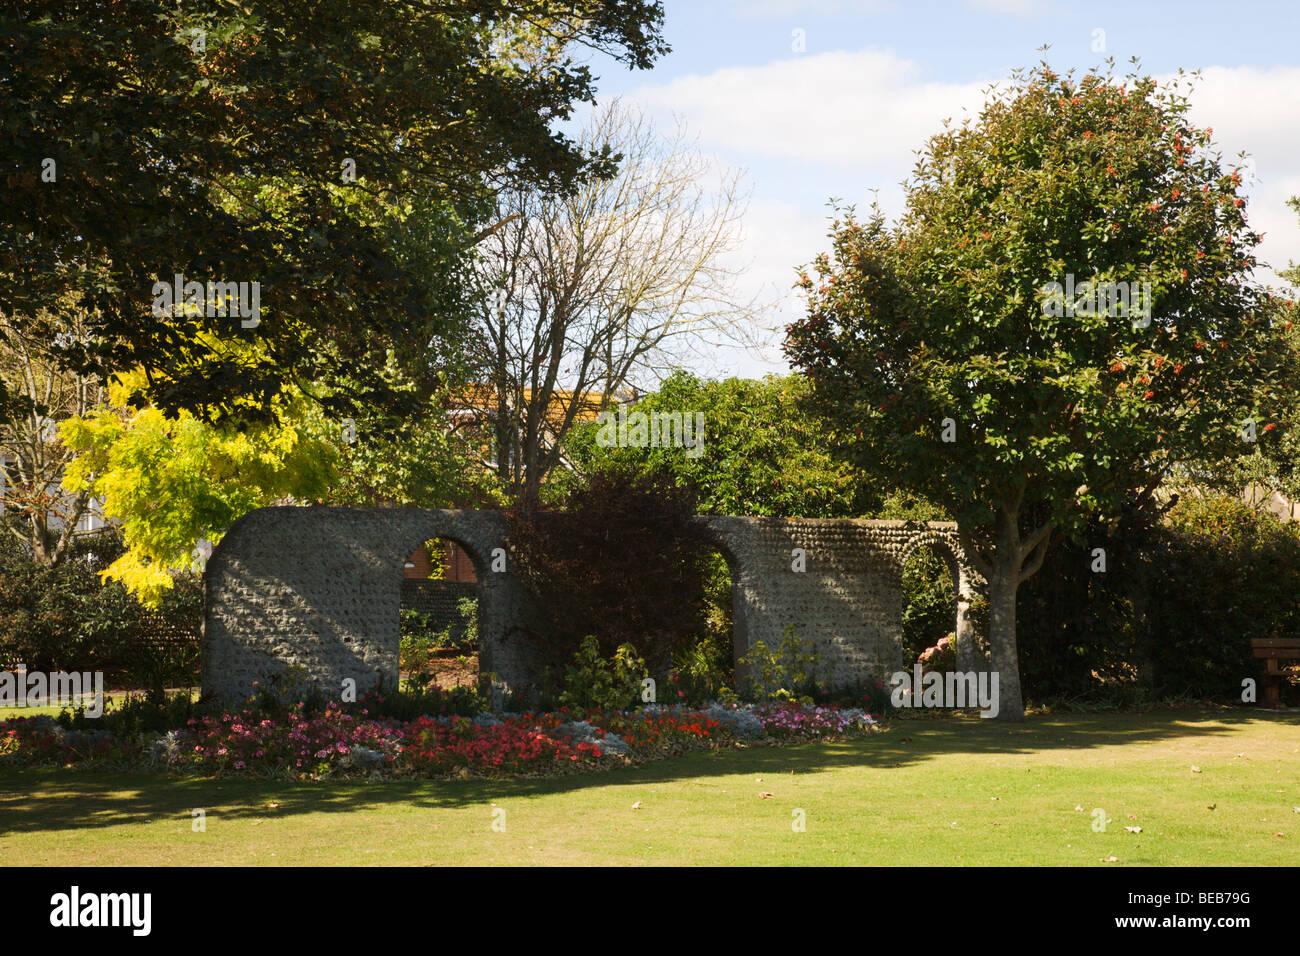 El Crouch, jardines Seaford, Sussex, Inglaterra, Reino Unido. Imagen De Stock